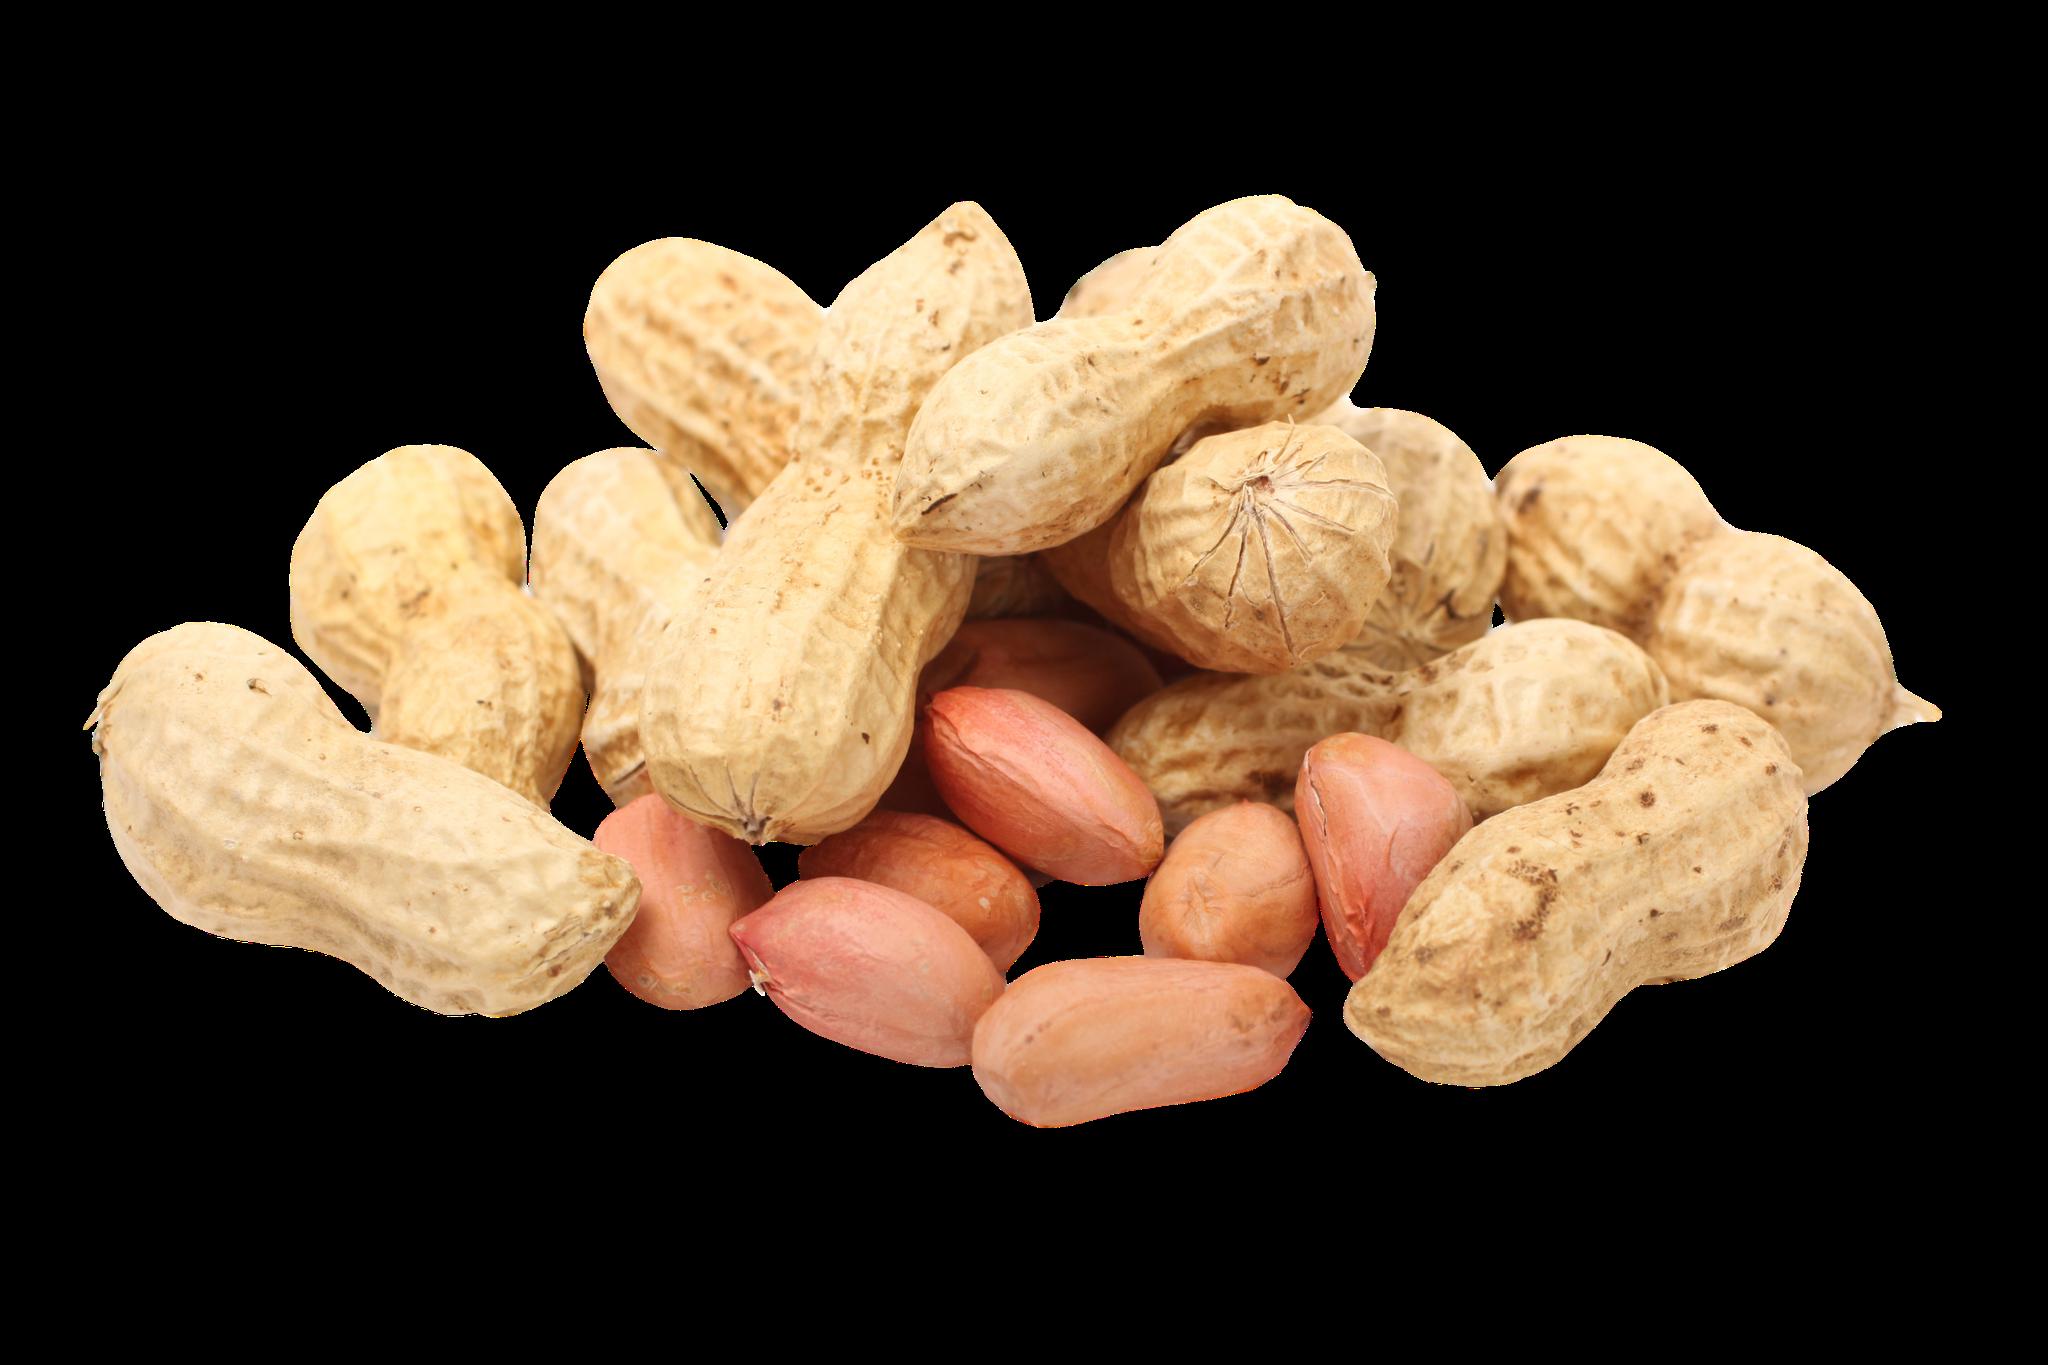 Peanuts clipart nut seed. Arachis hypogaea perfect nuts